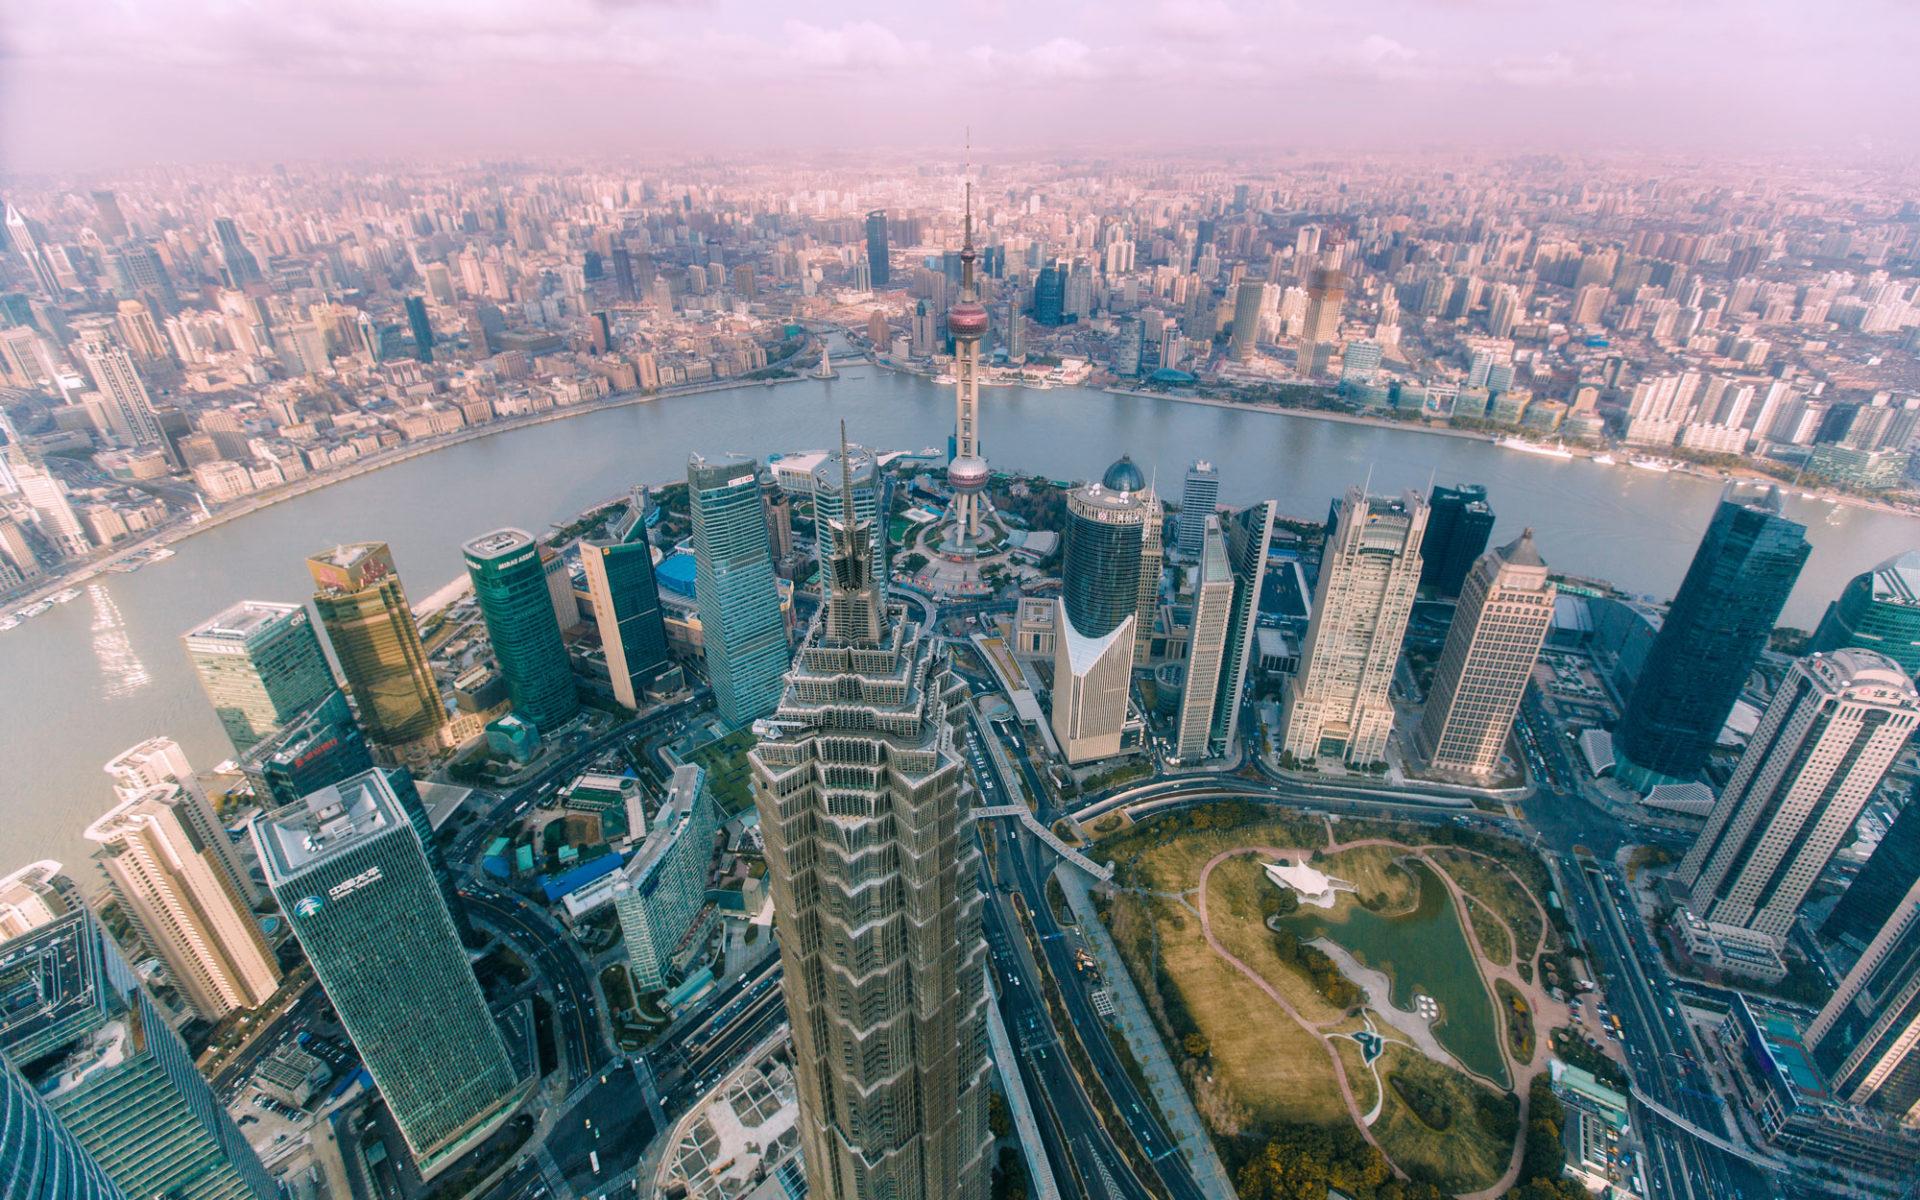 1. Башня Цзинь Мао (Шанхай, Китай) – 420 метров.